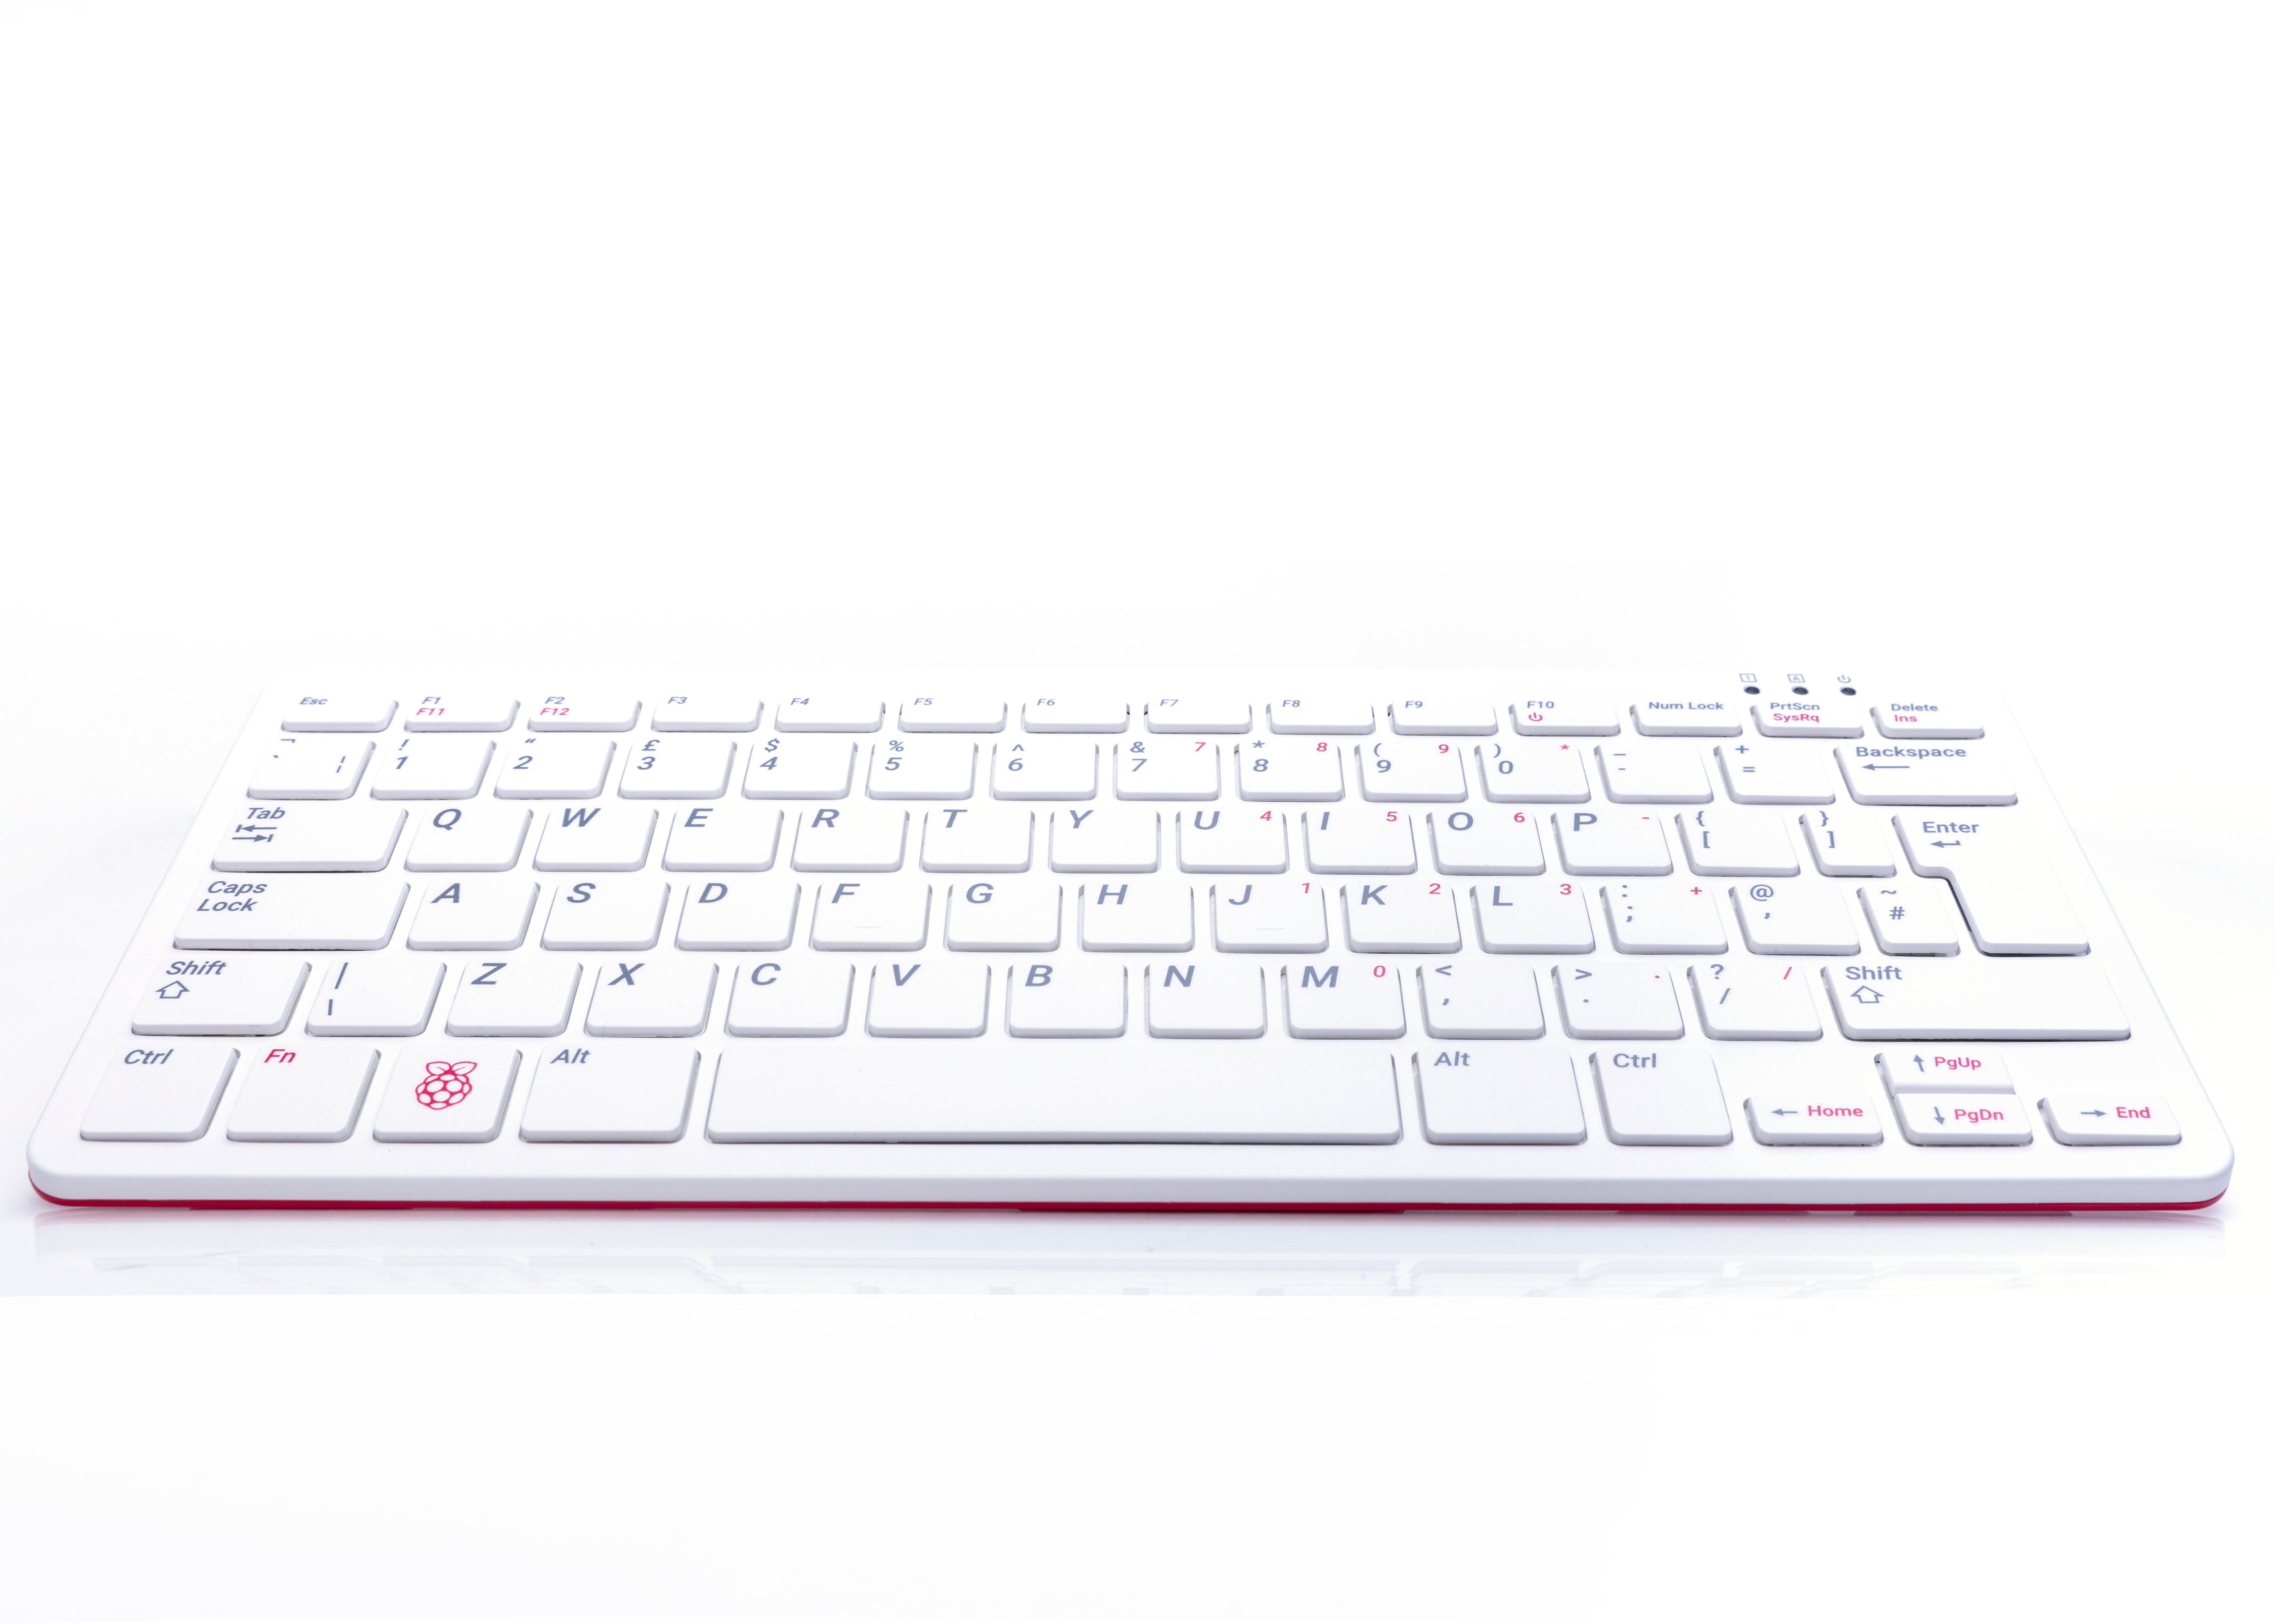 Raspberry Pi 400 Italian Keyboard Layout - Computer Only